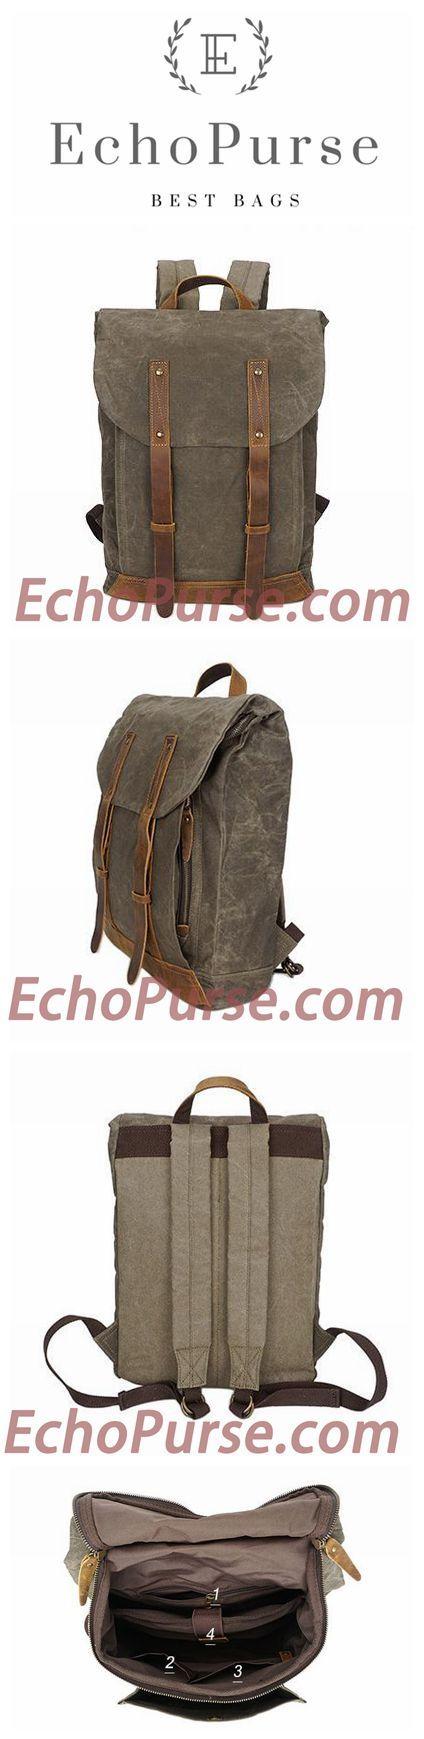 Canvas Backpack, Vintage Waterproof Travel Fashion Bag For Man YD162